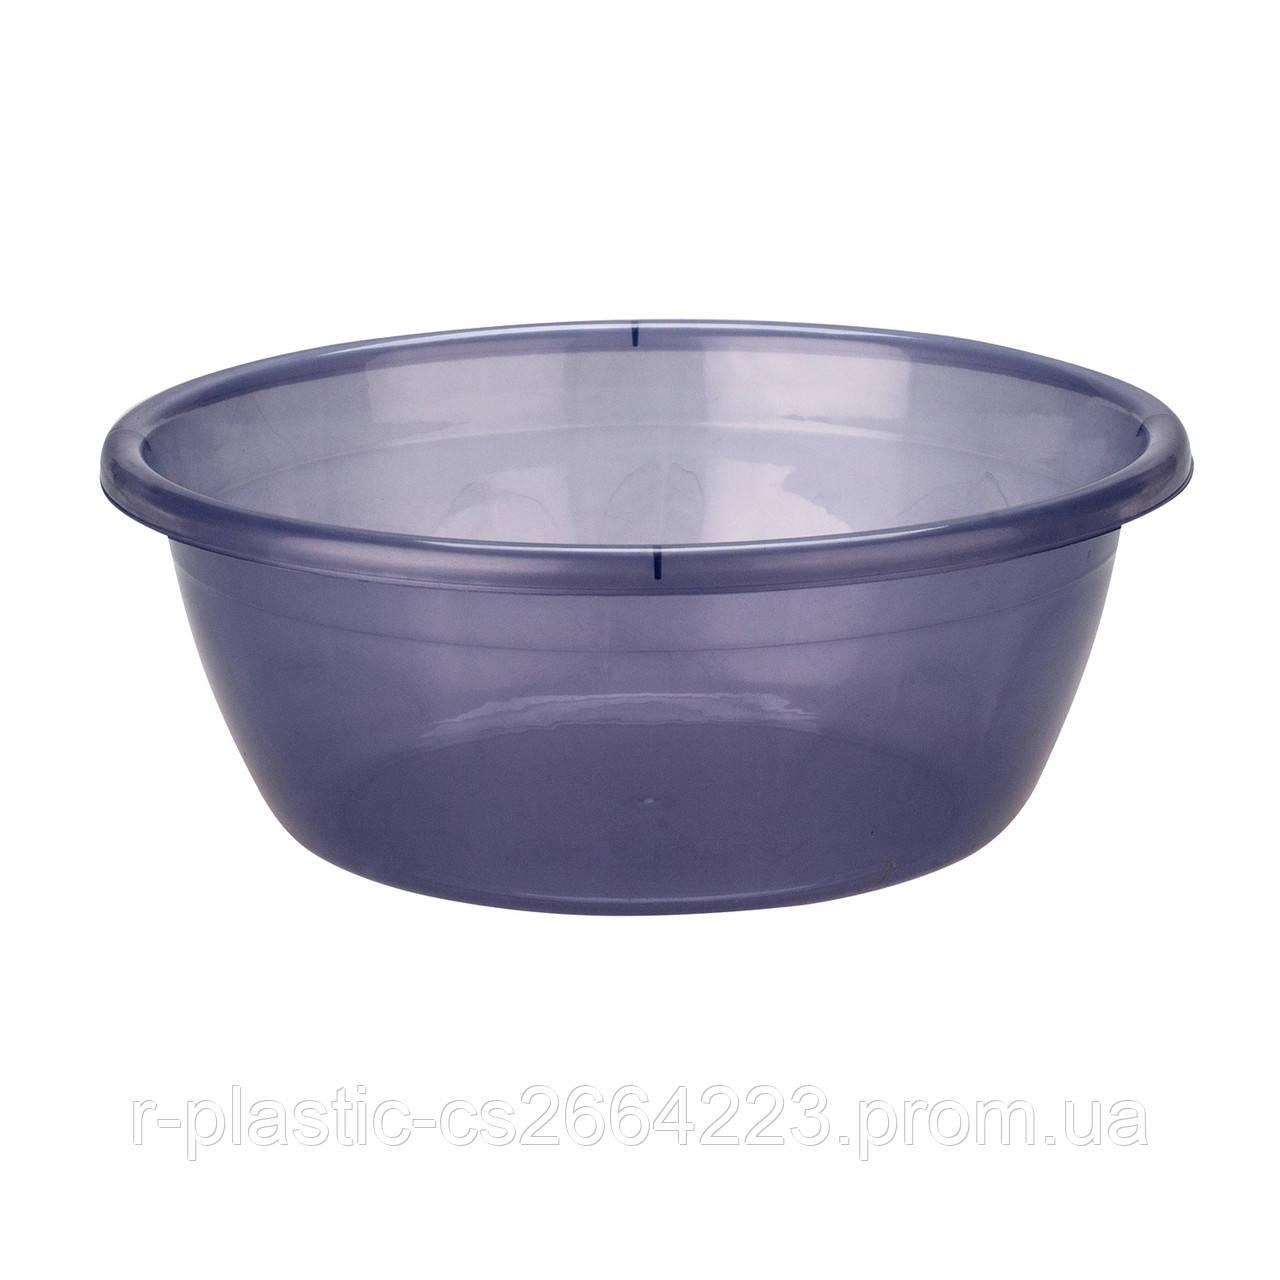 Миска R-Plastic прозрачная 10л фиолетовая